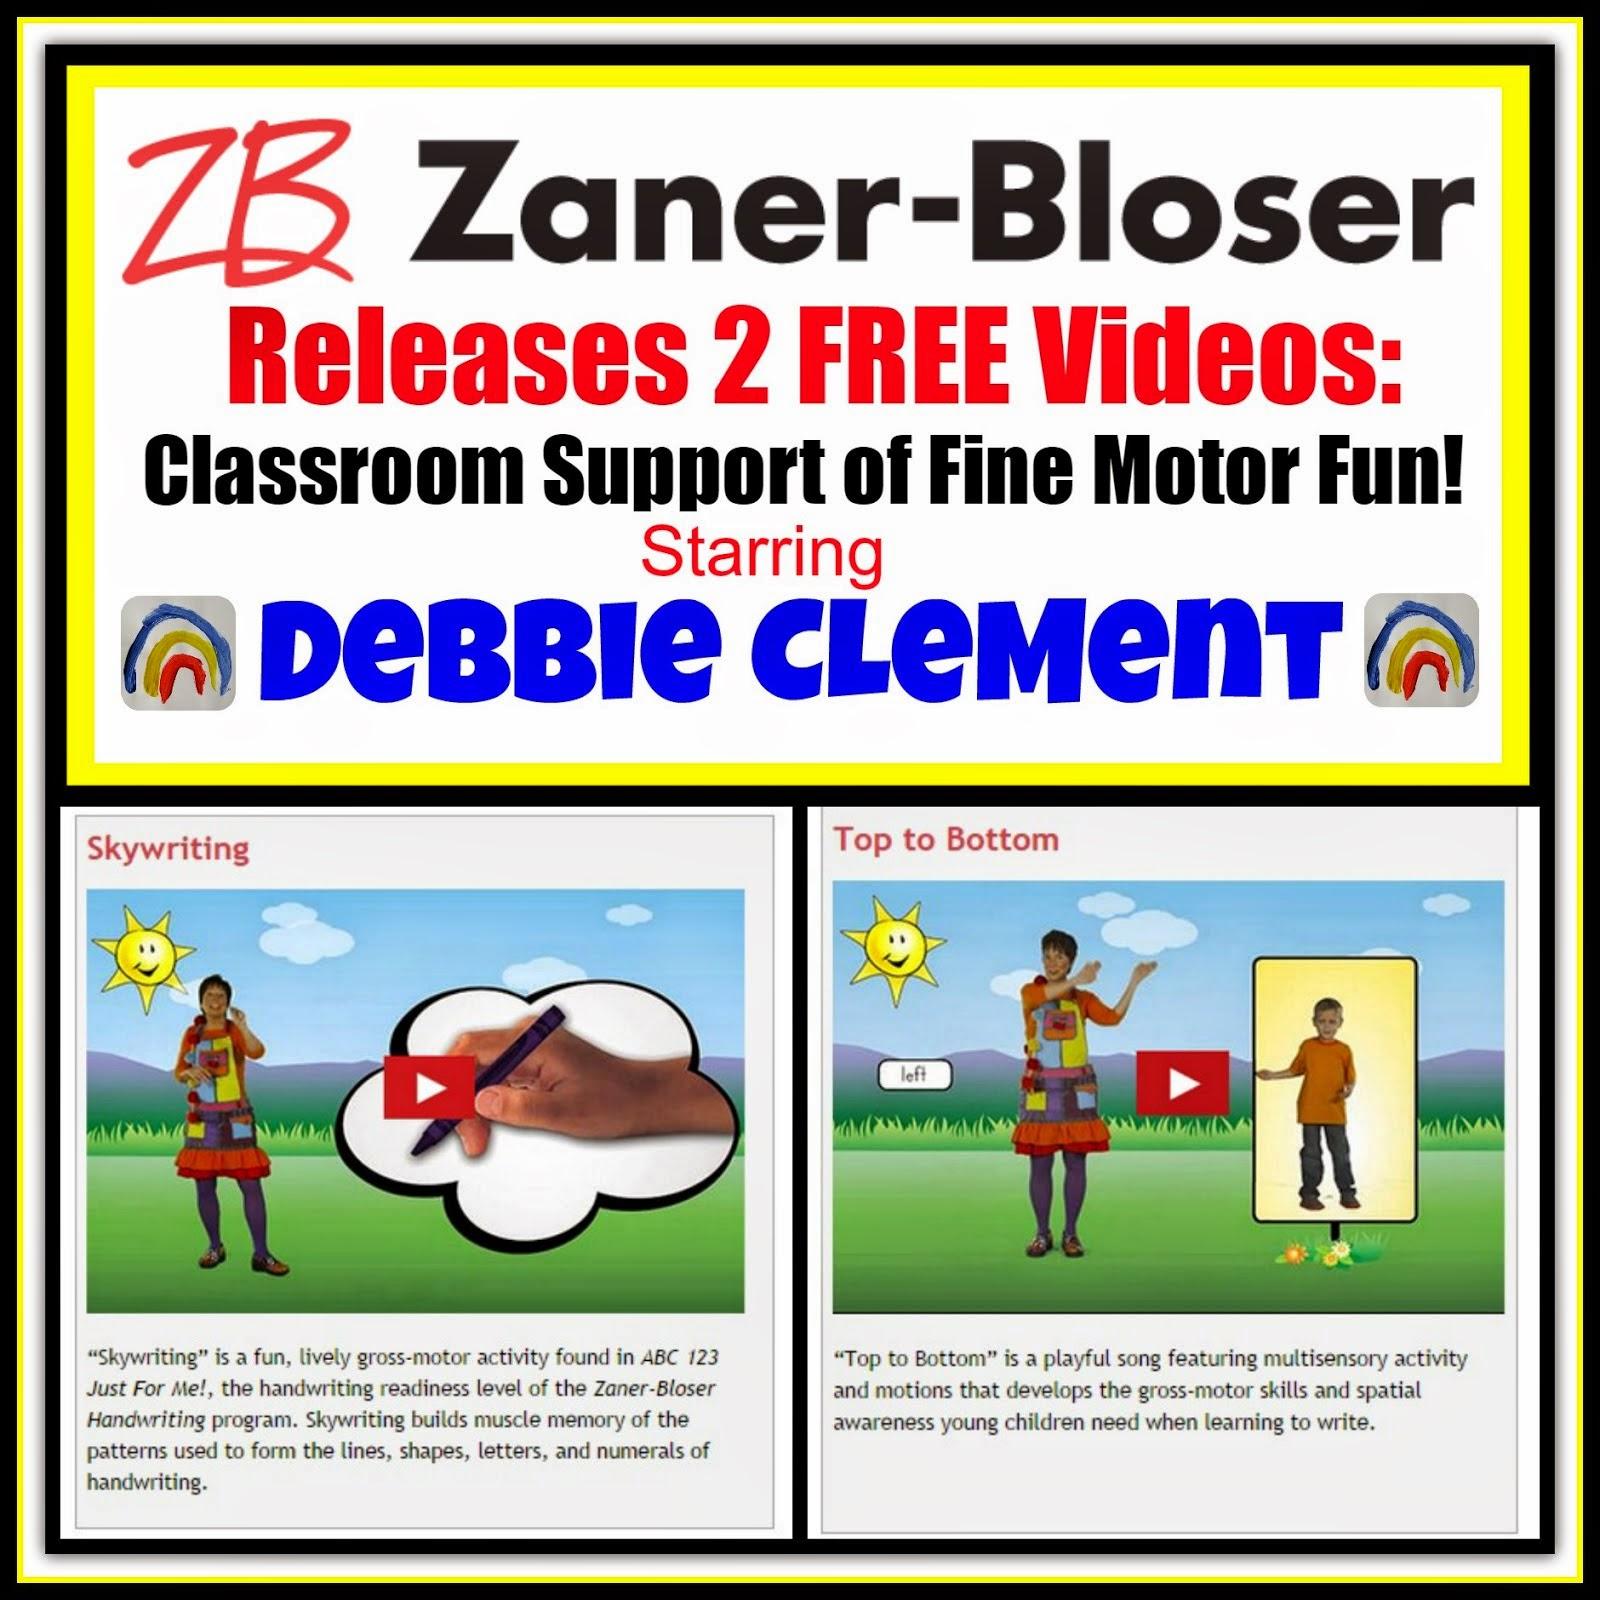 2 FREE Videos: Zaner-Bloser FUN!